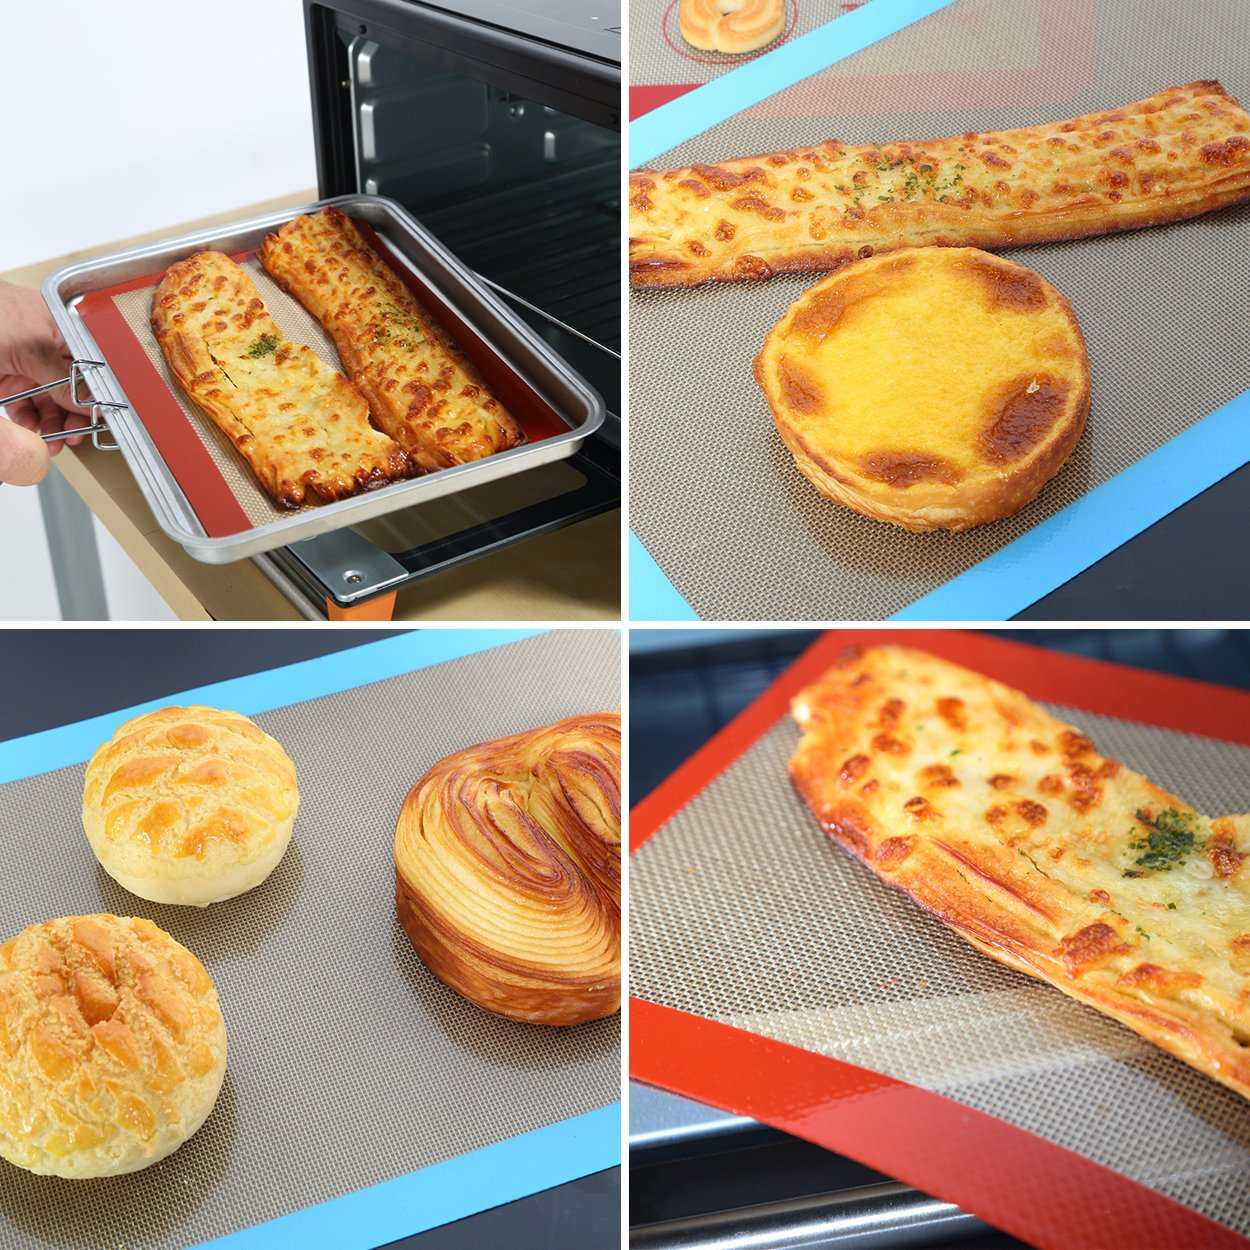 Alimat Plus Silicon Baking mat Cookie Sheet Non Stick Dishwasher Safe Reusable by Alimat Plus (Image #5)